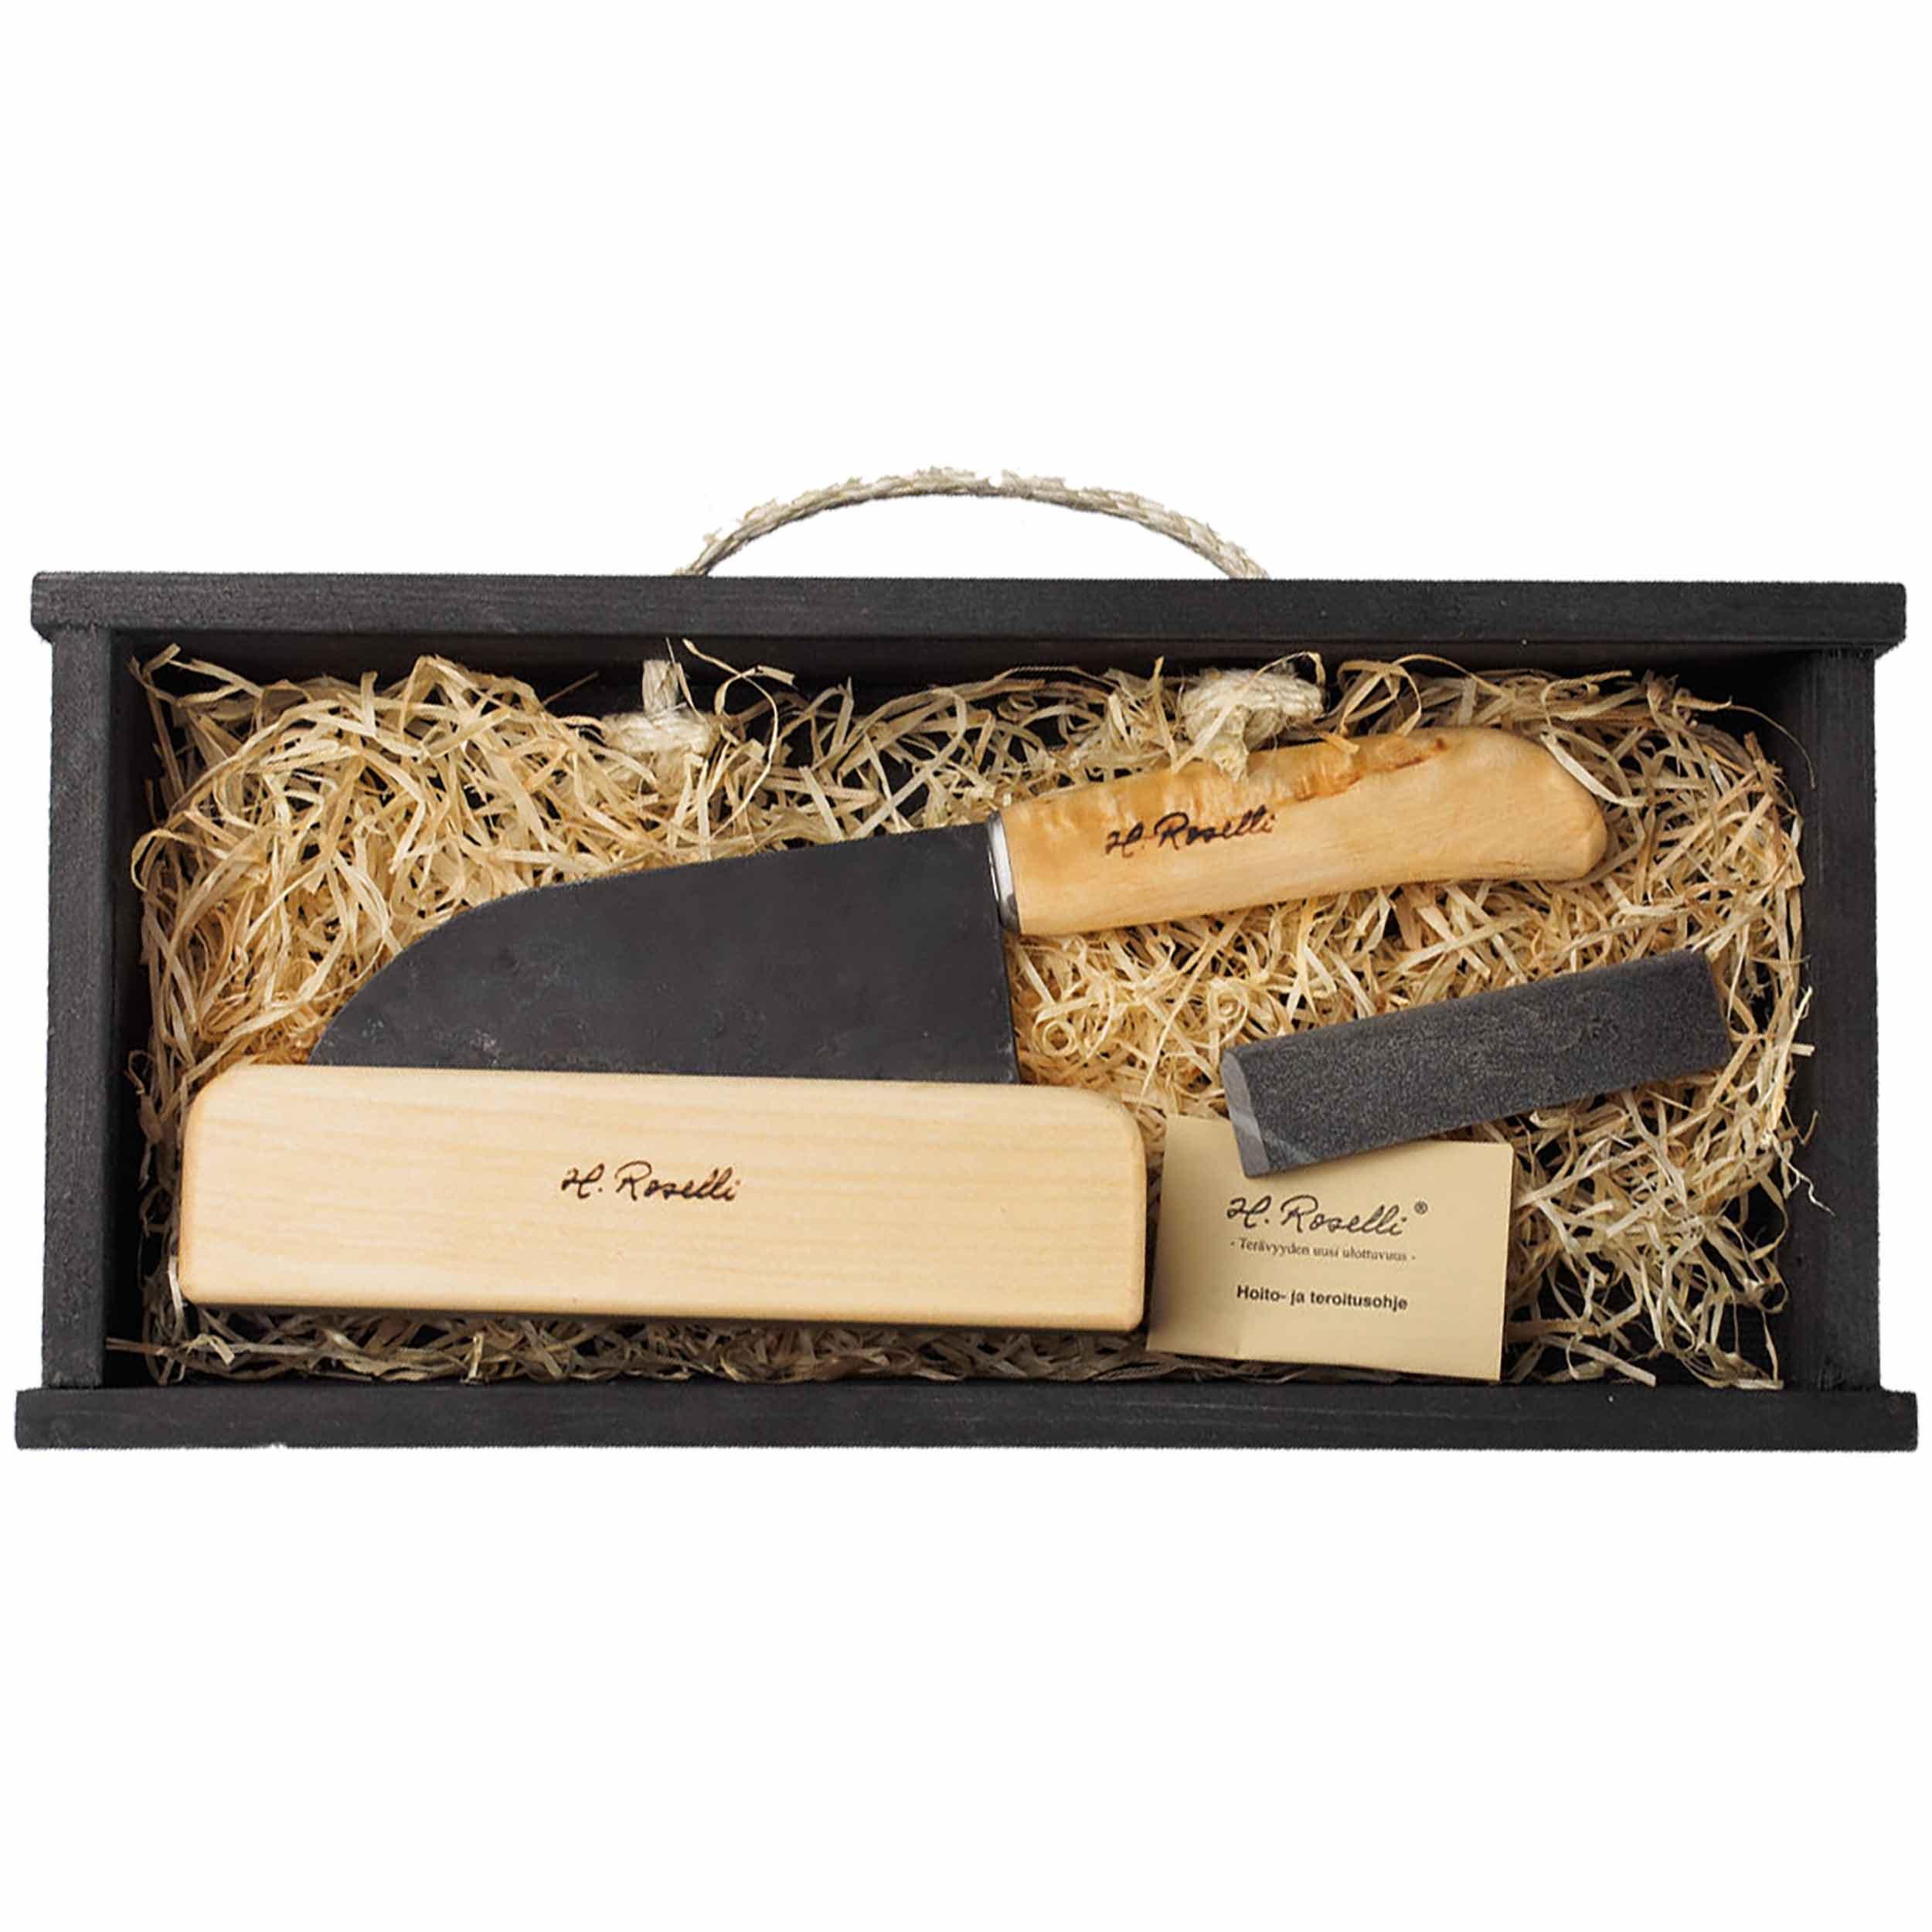 Roselli R700P Santoku Messer 14 cm als Geschenkset